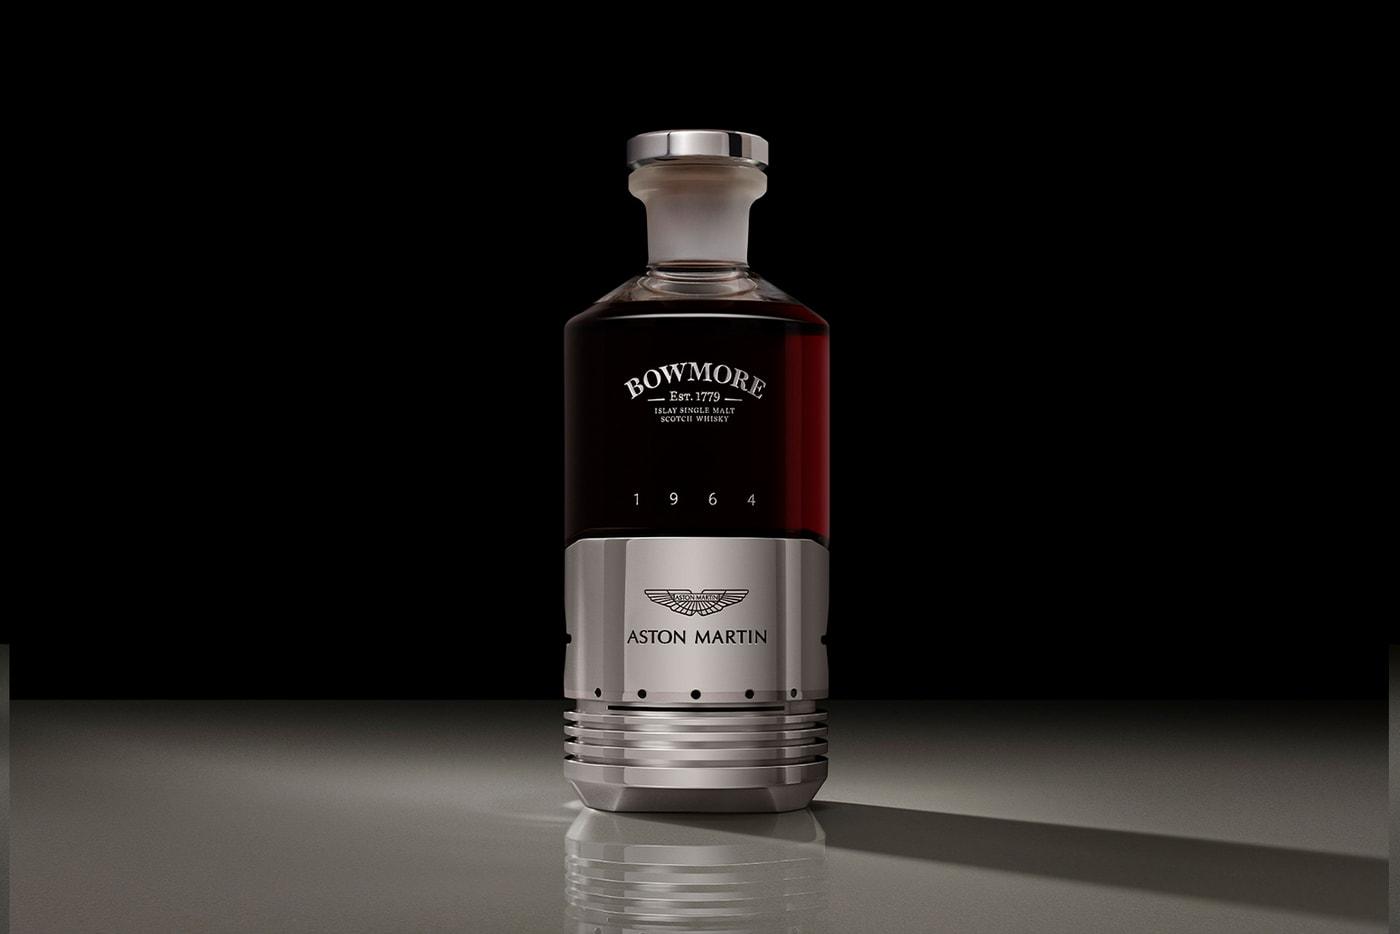 https%3A%2F%2Fhypebeast.com%2Fimage%2F2020%2F08%2Faston-martin-bowmore-black-db5-1964-whisky-release-2.jpg?q=90&w=1400&cbr=1&fit=max